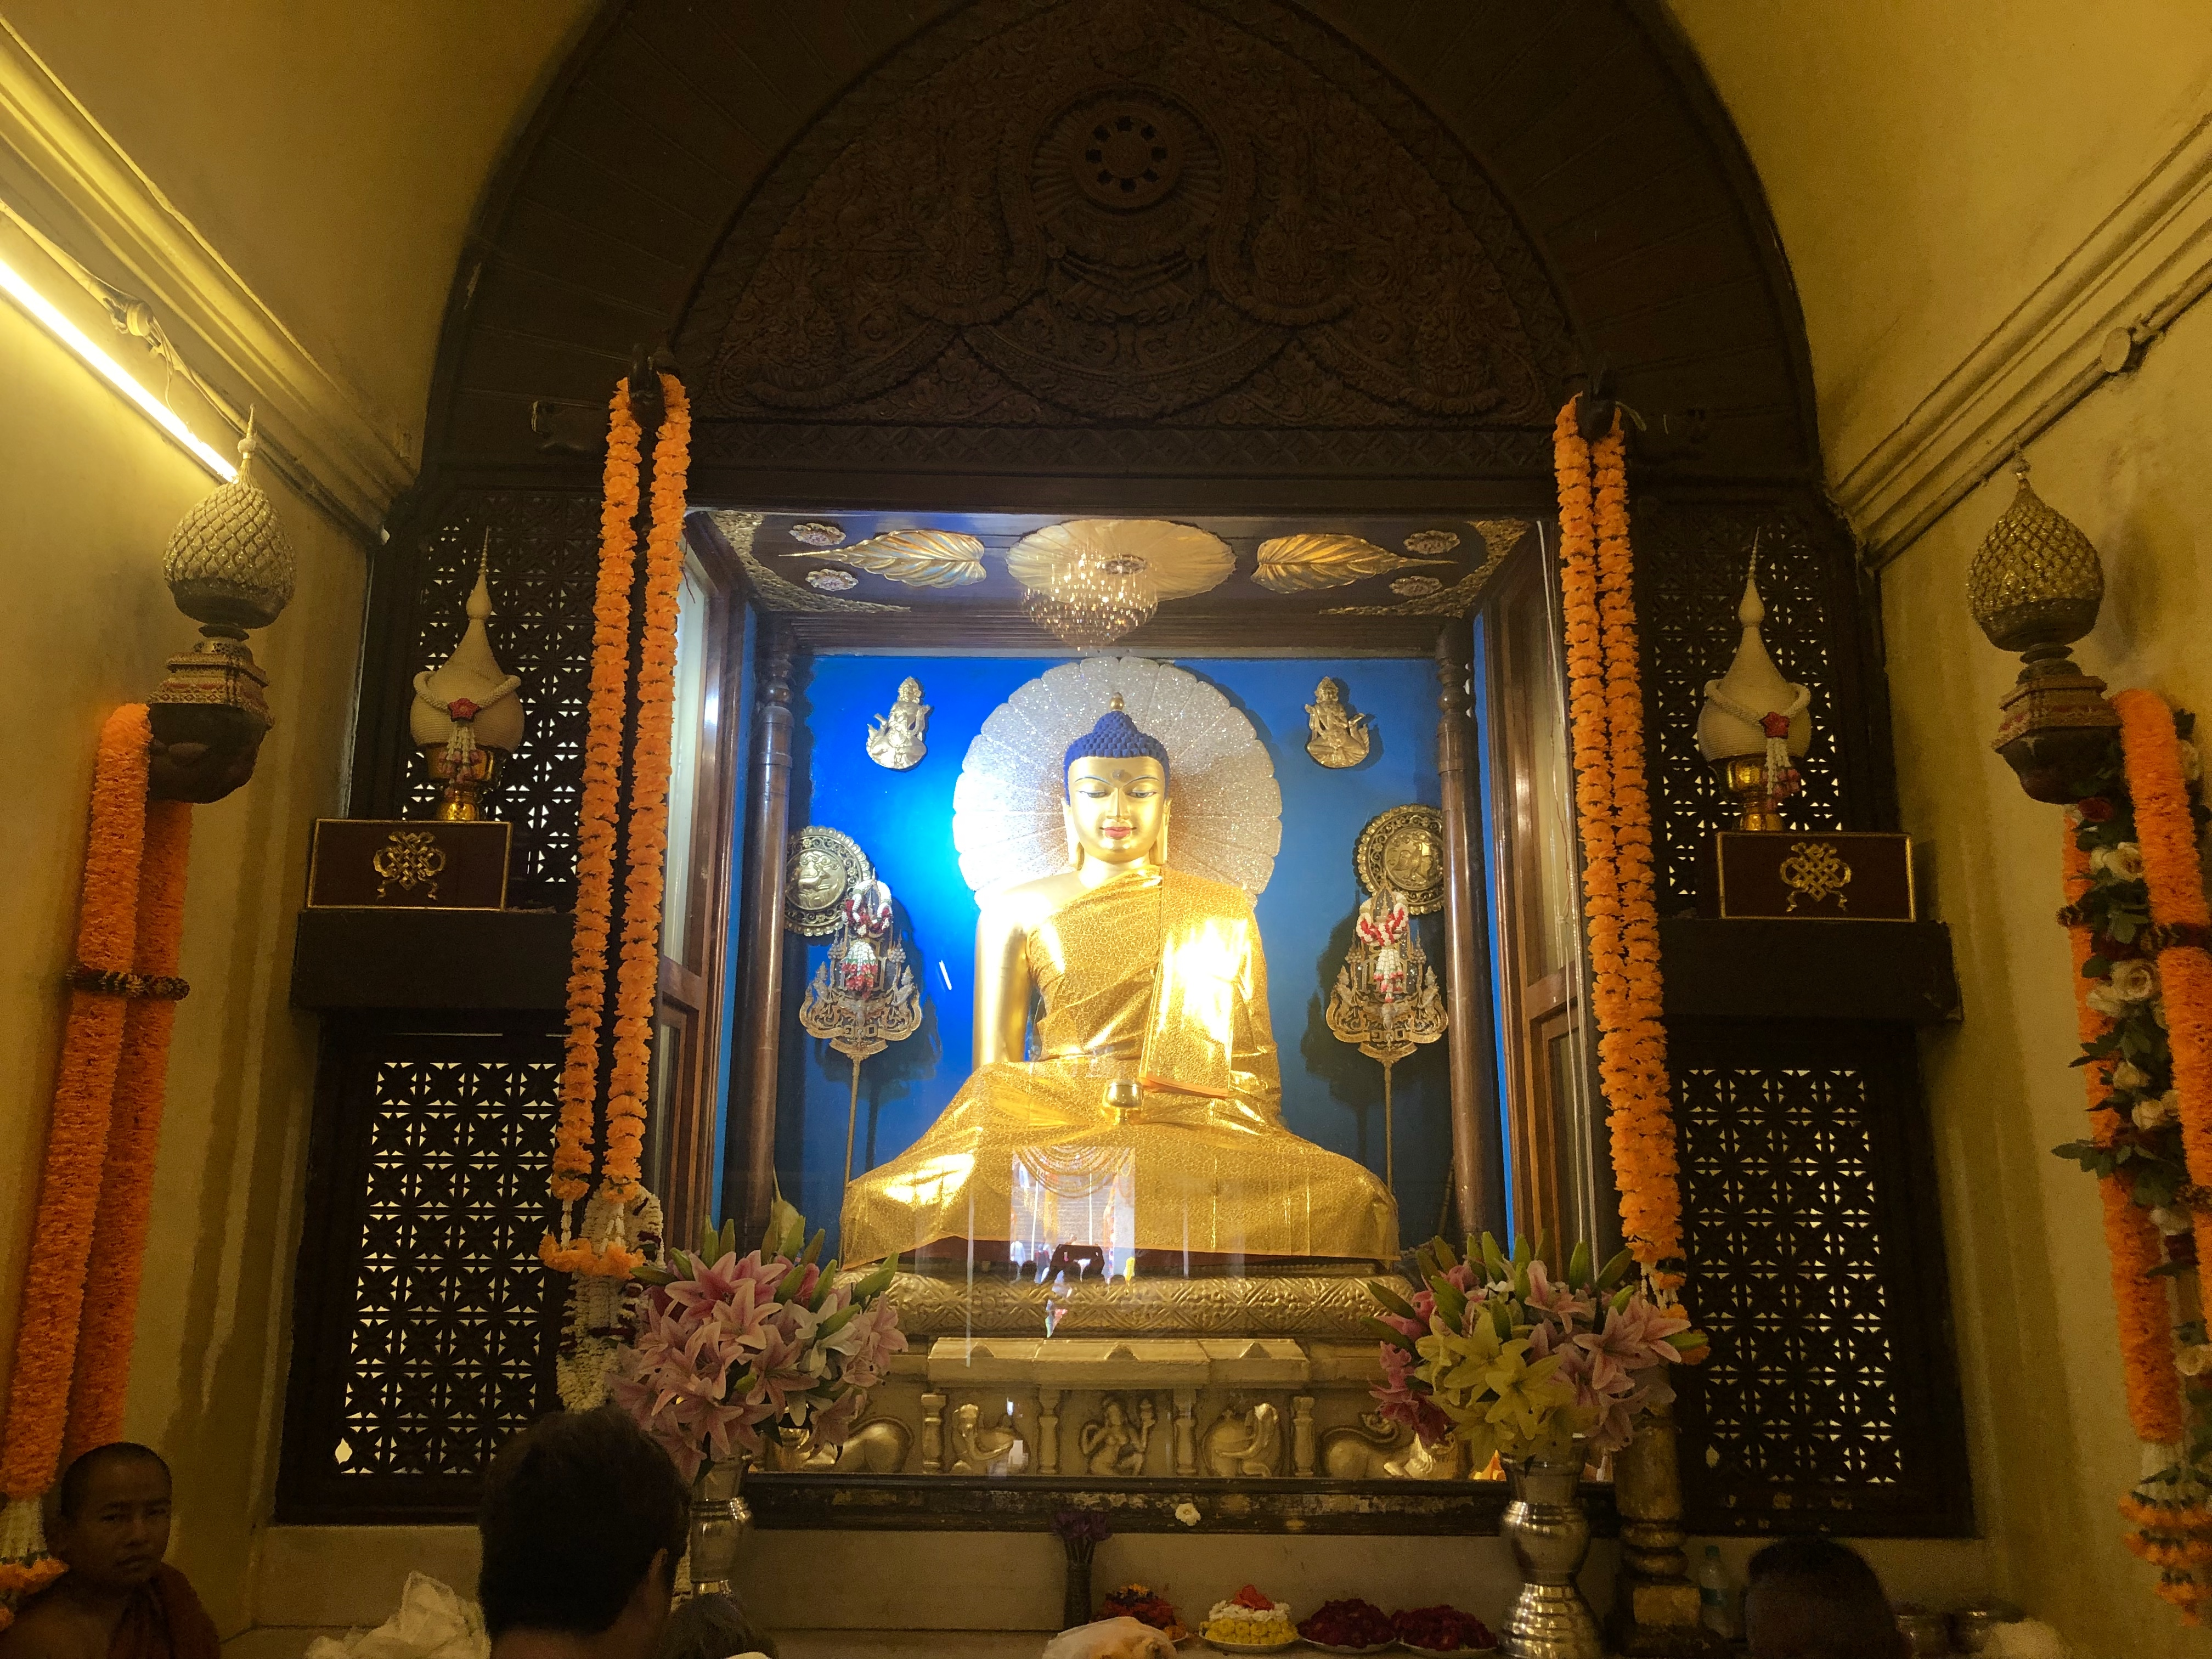 Buddha-Statue im Mahabodhi-Tempel. Rigpa Gebetsfest, März 2019, Bodhgaya (Indien)